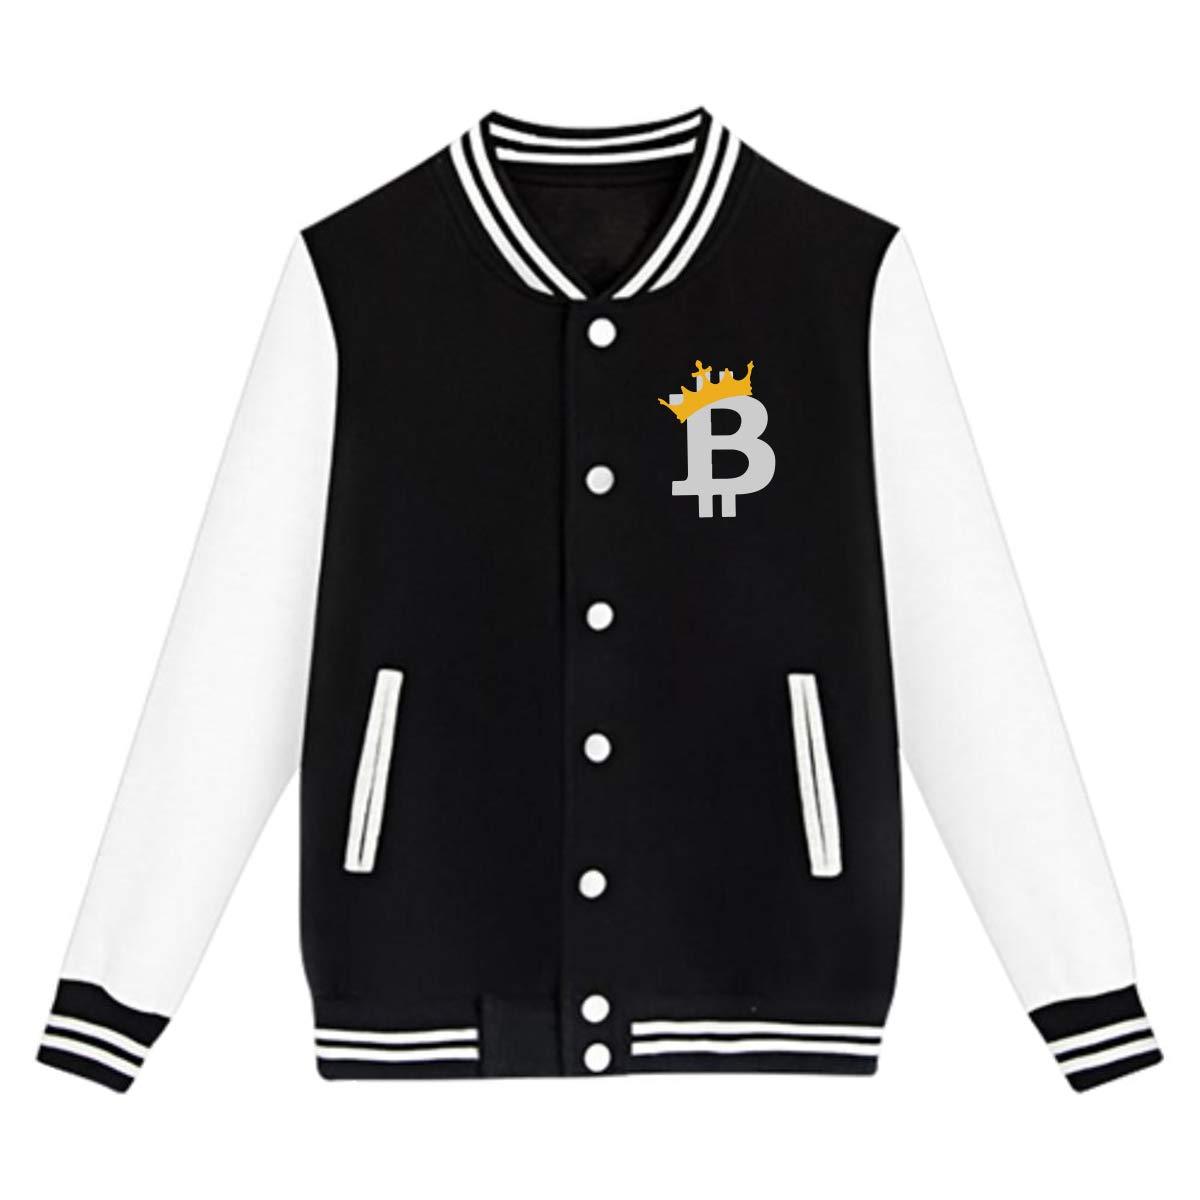 Bitcoin King Teens Boys Girl Varsity Baseball Jacket Long Sleeve Sport Baseball Uniform Jacket Coat Sweater Black